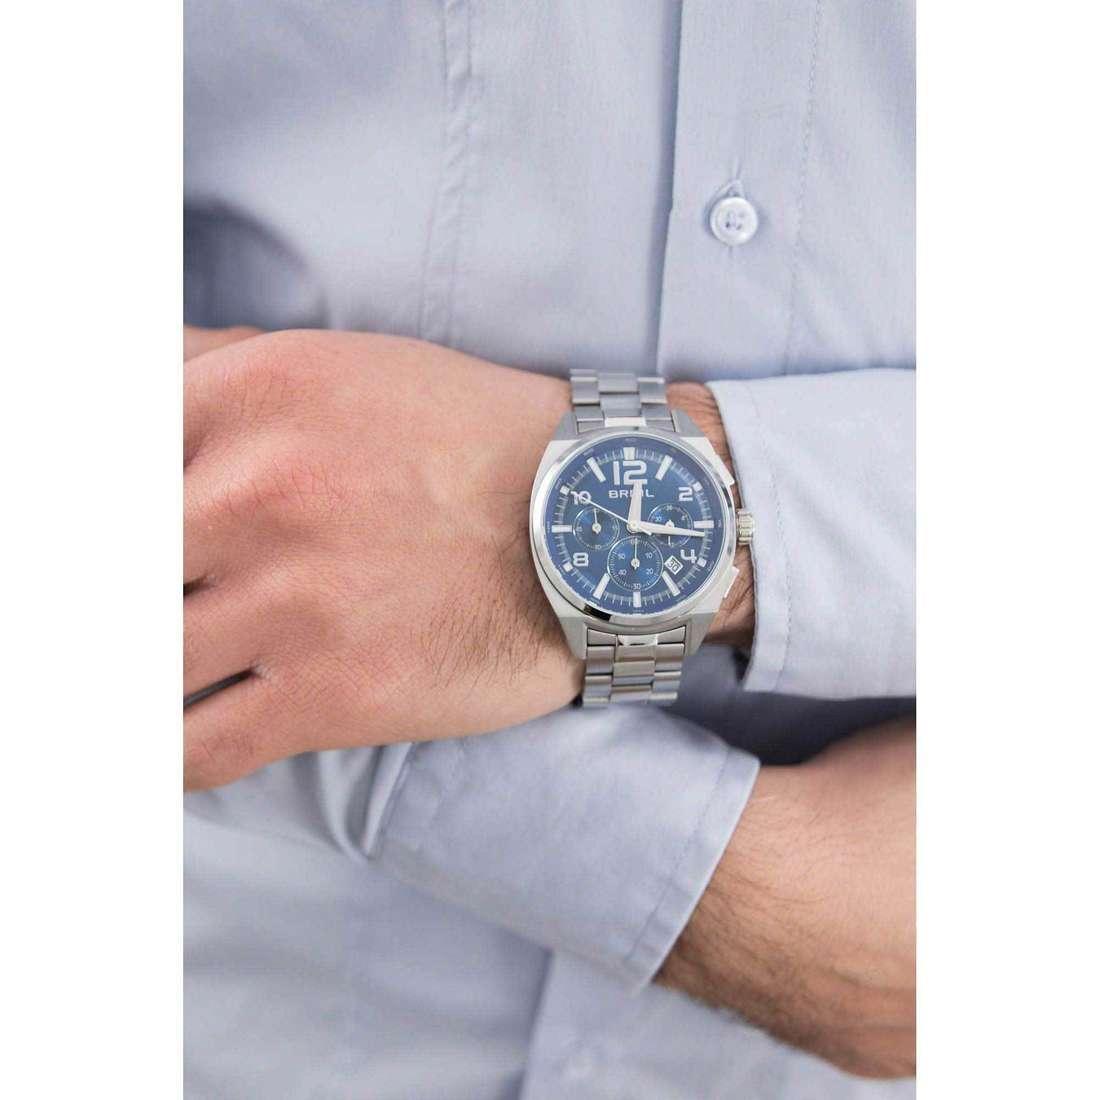 Breil cronografi Master uomo TW1404 indosso